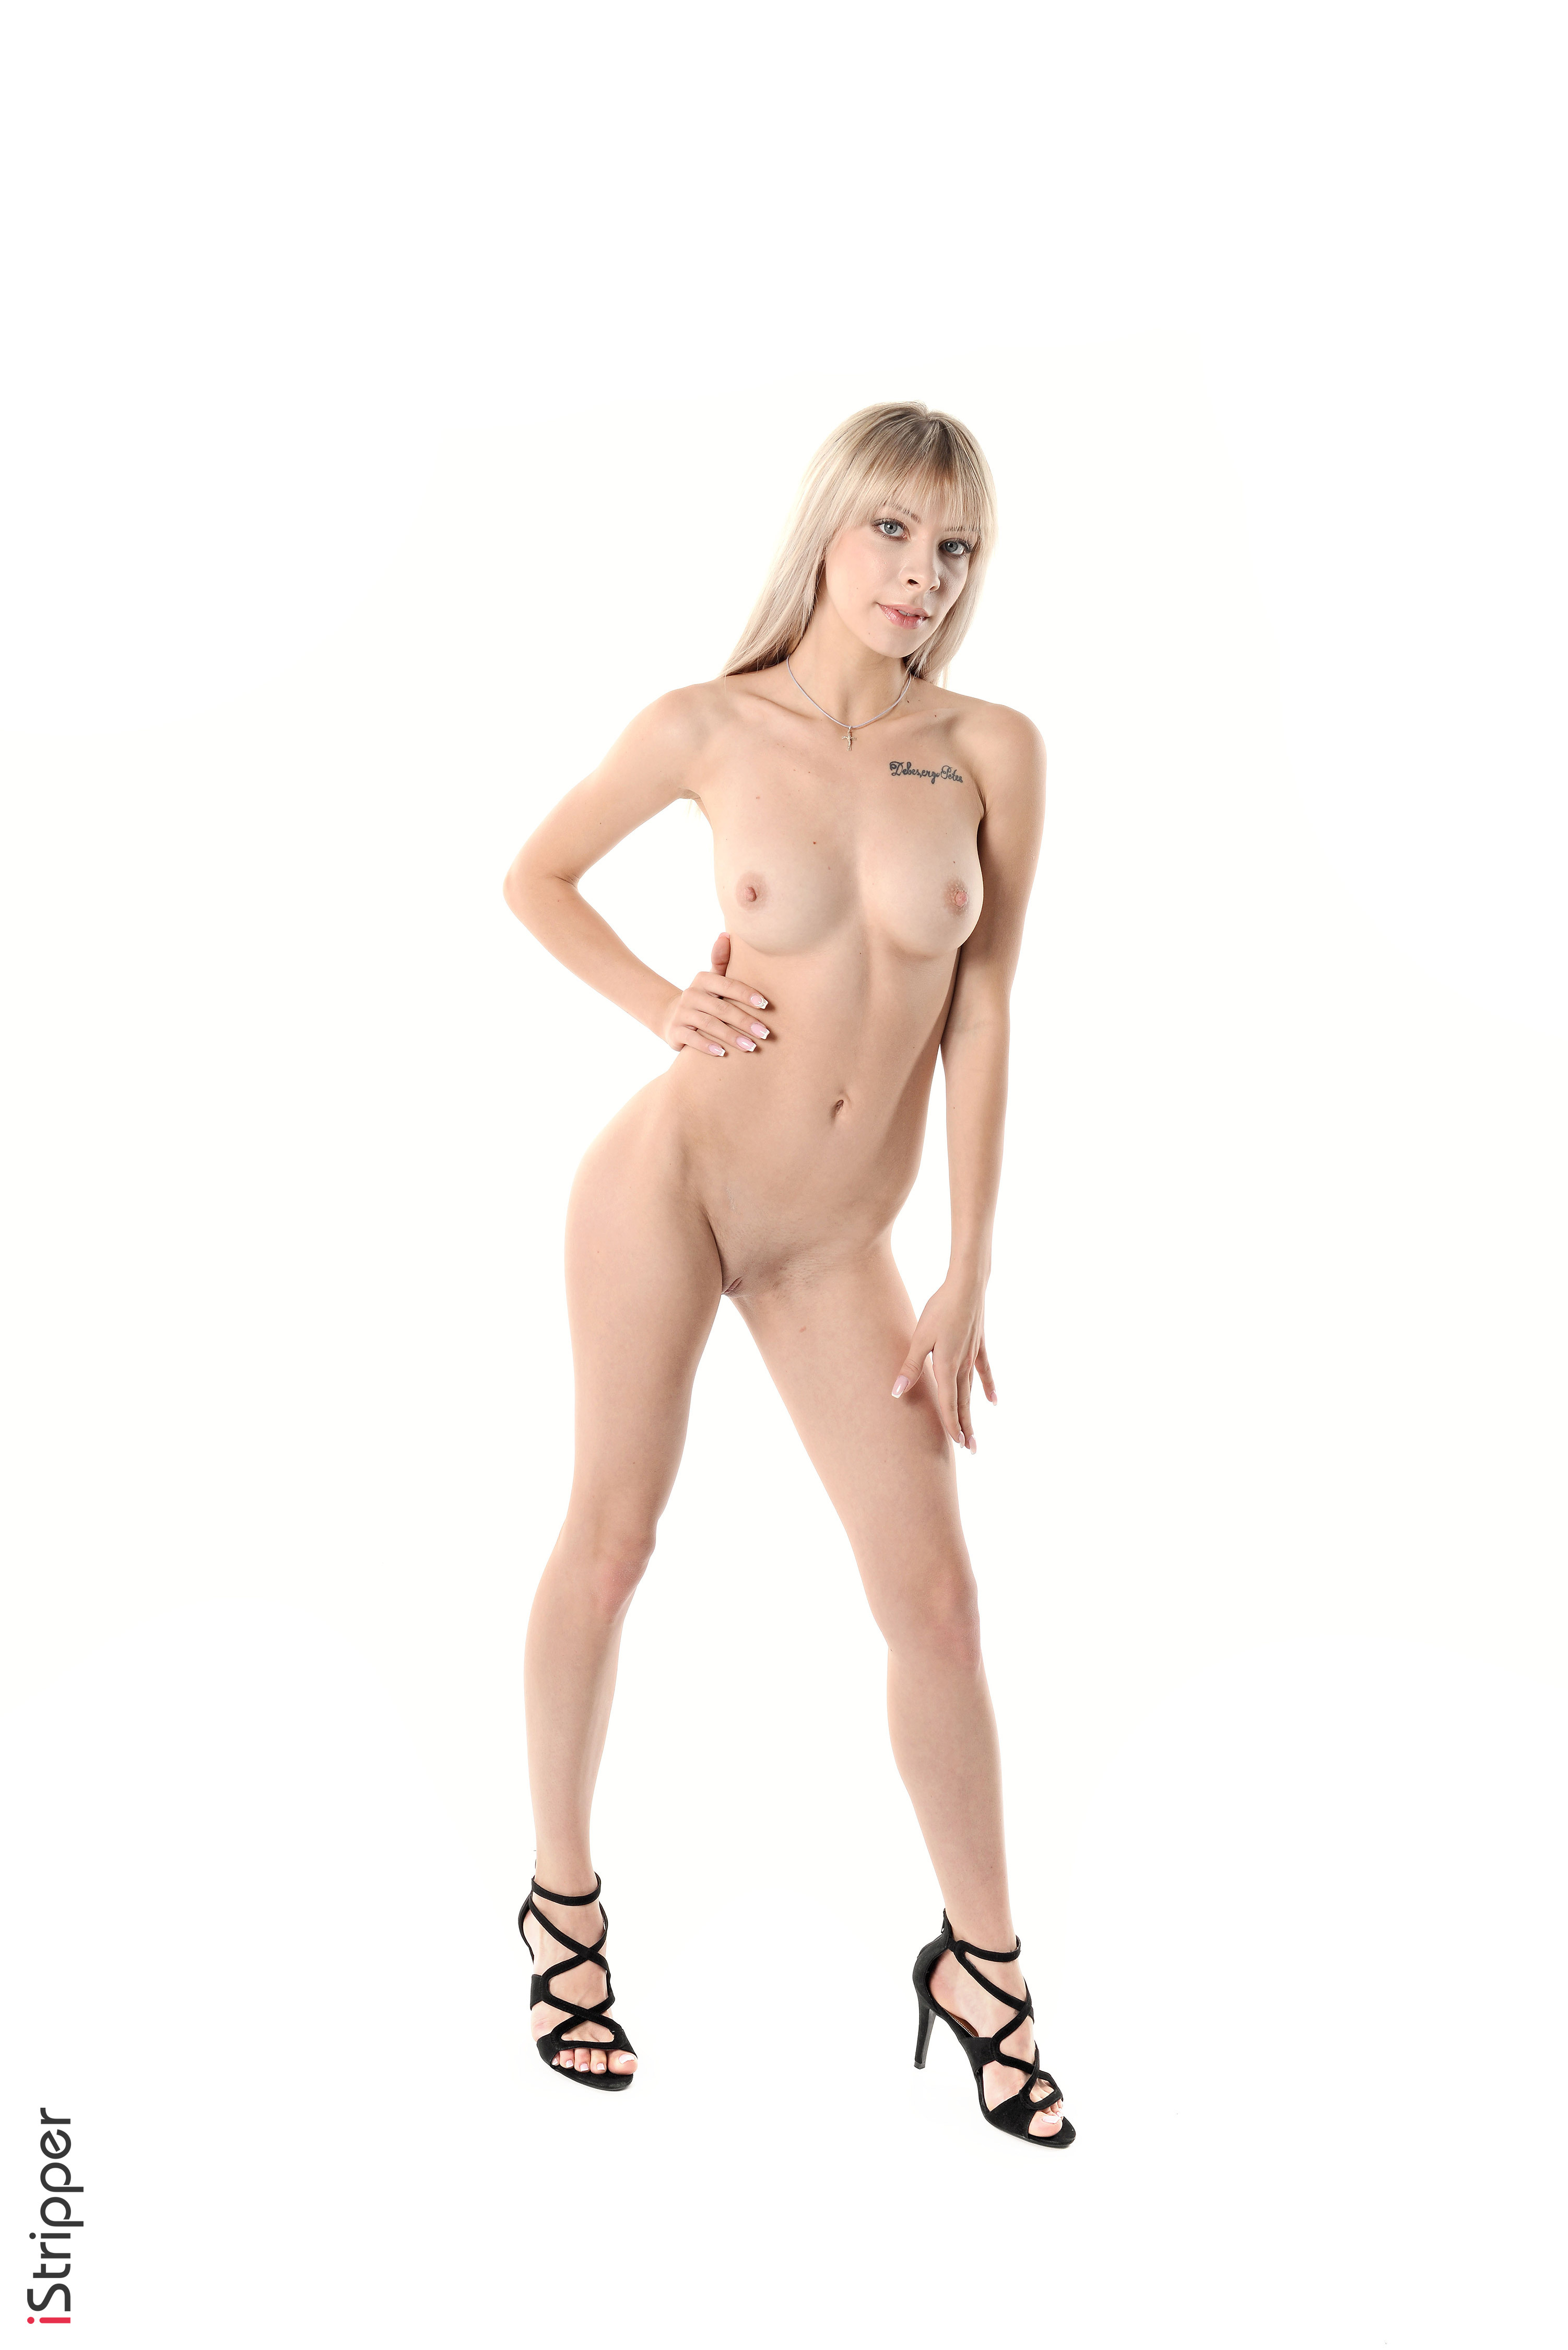 stripping for girls